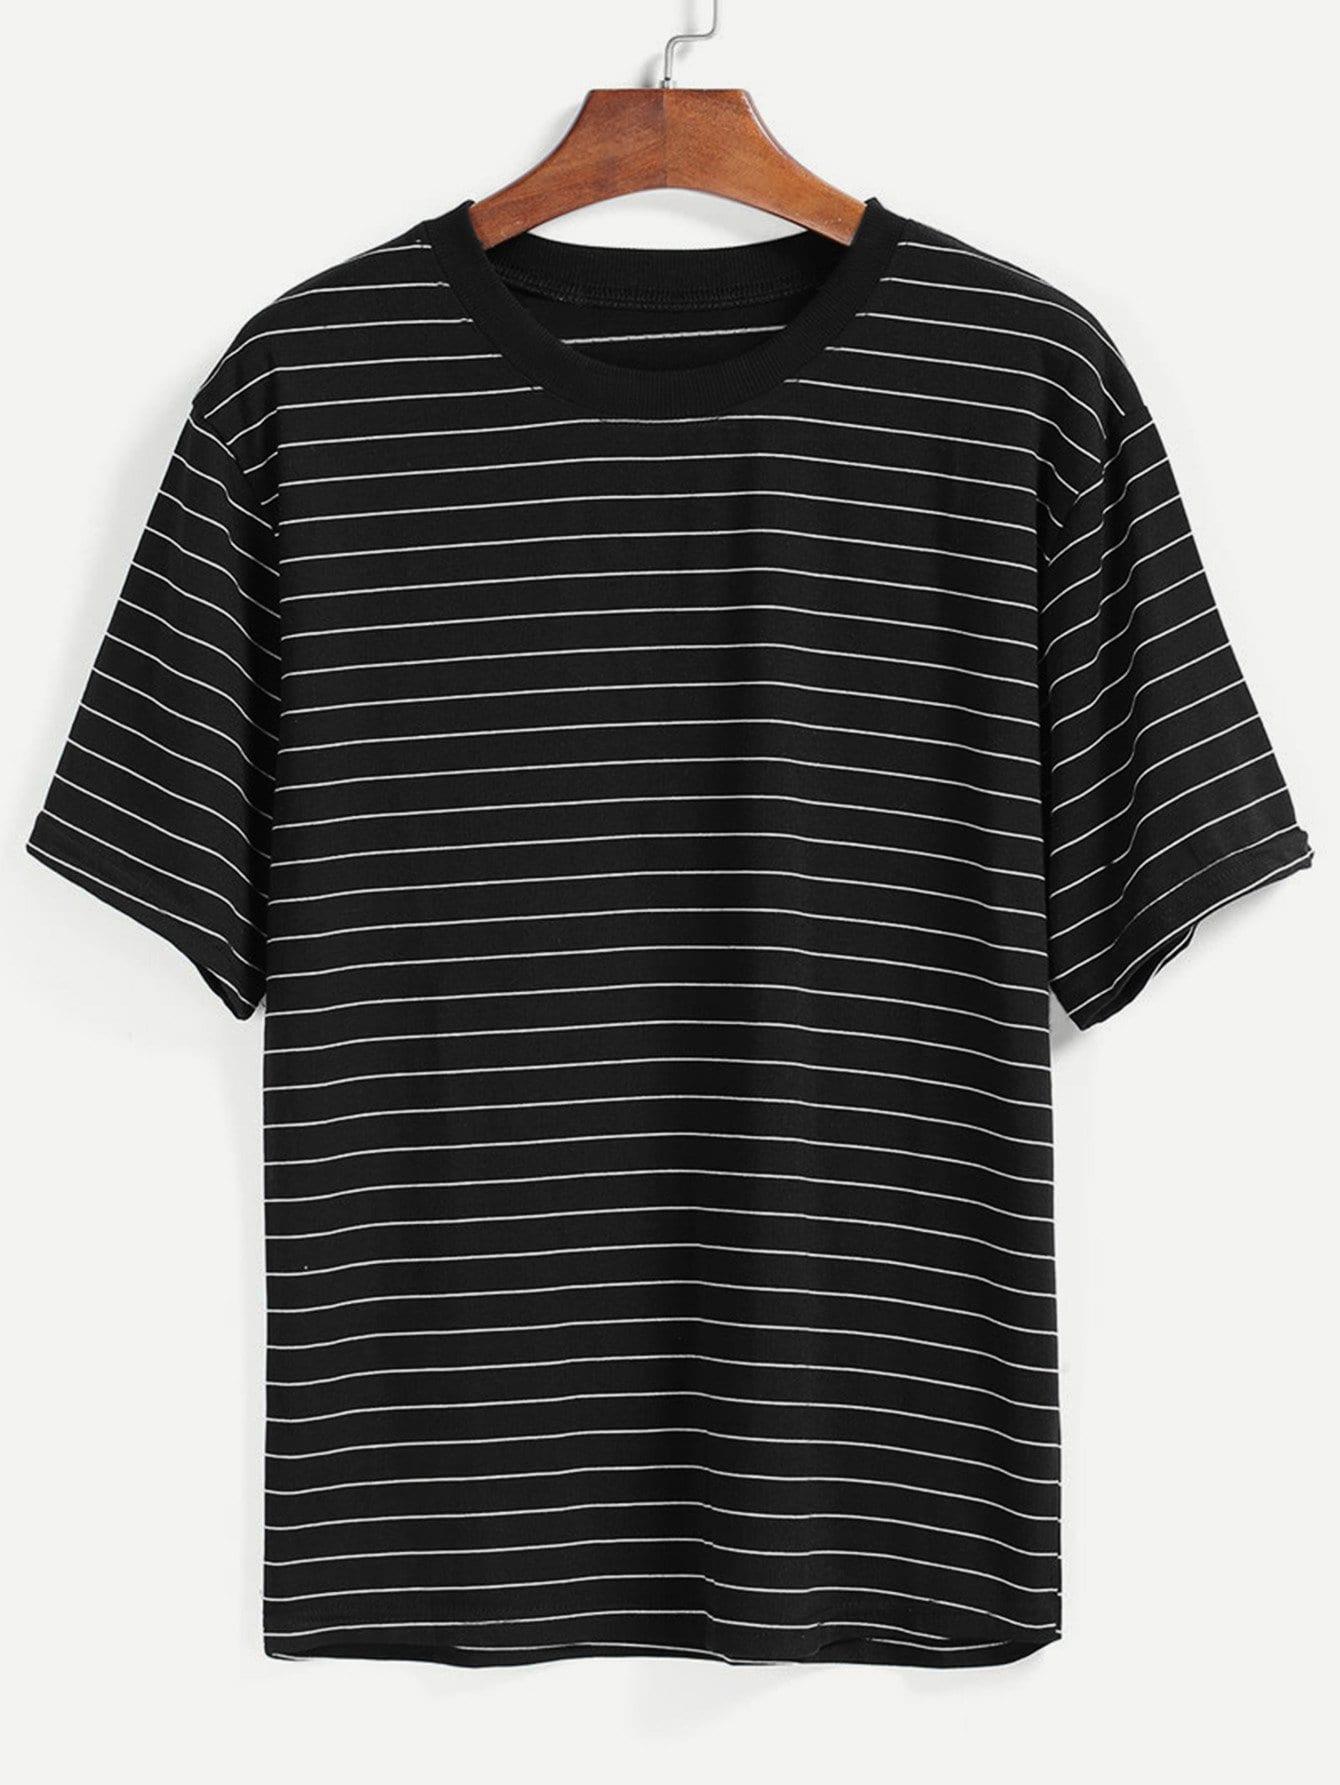 Чёрная полосатая футболка от SheIn